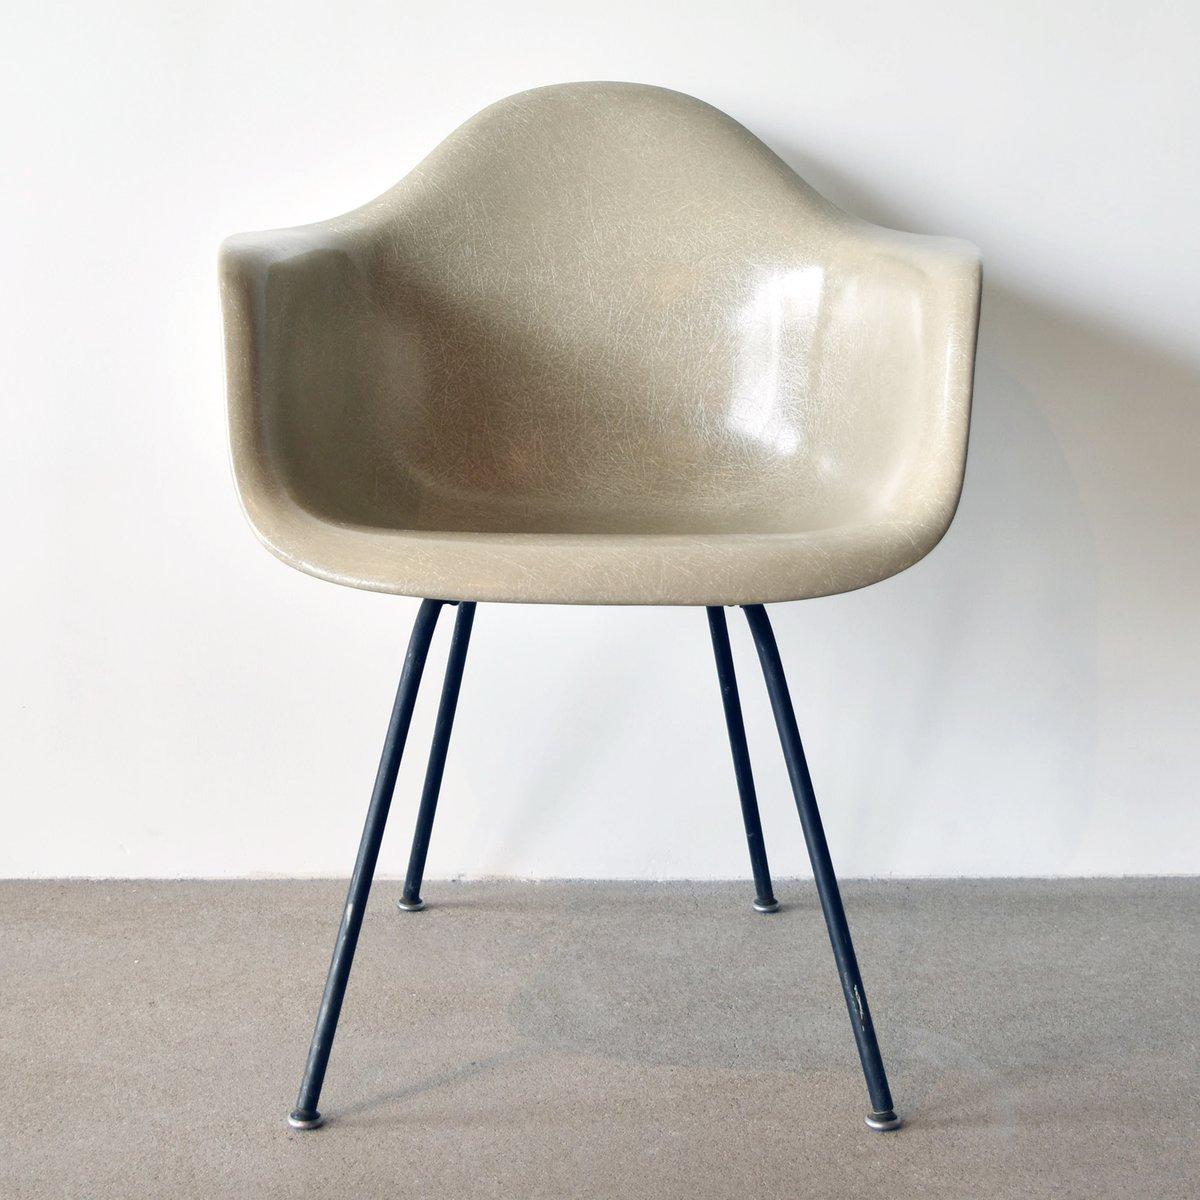 chaise dax par charles and ray eames pour herman miller 1955 en vente sur pamono. Black Bedroom Furniture Sets. Home Design Ideas